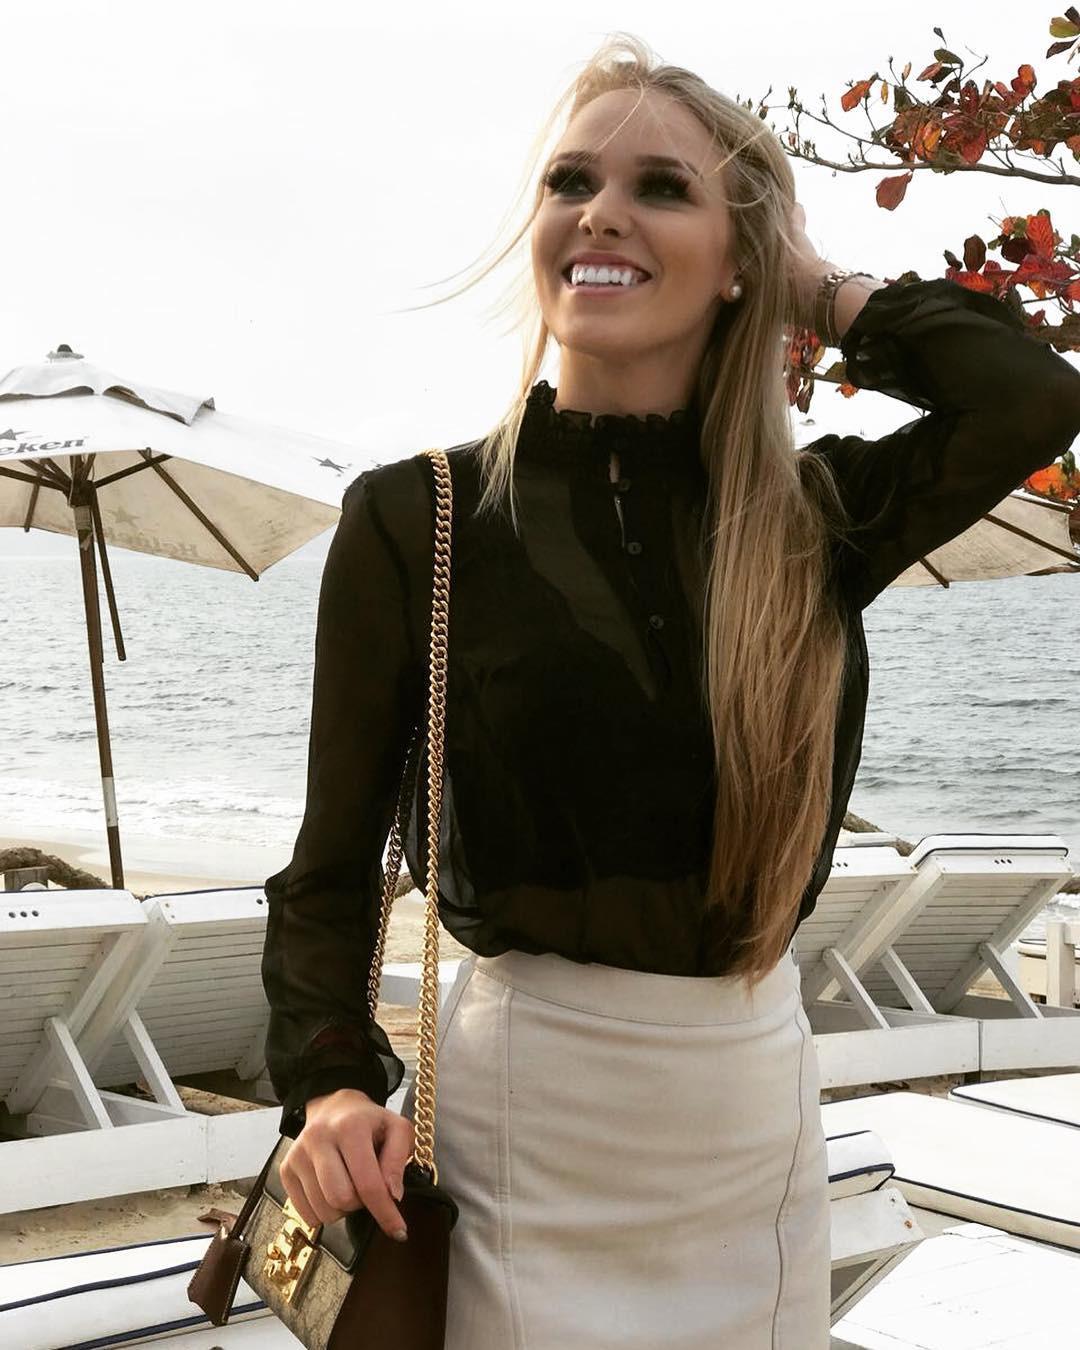 elizama aguilar, top 5 de miss brasil mundo 2019. - Página 3 Bd2h8b10